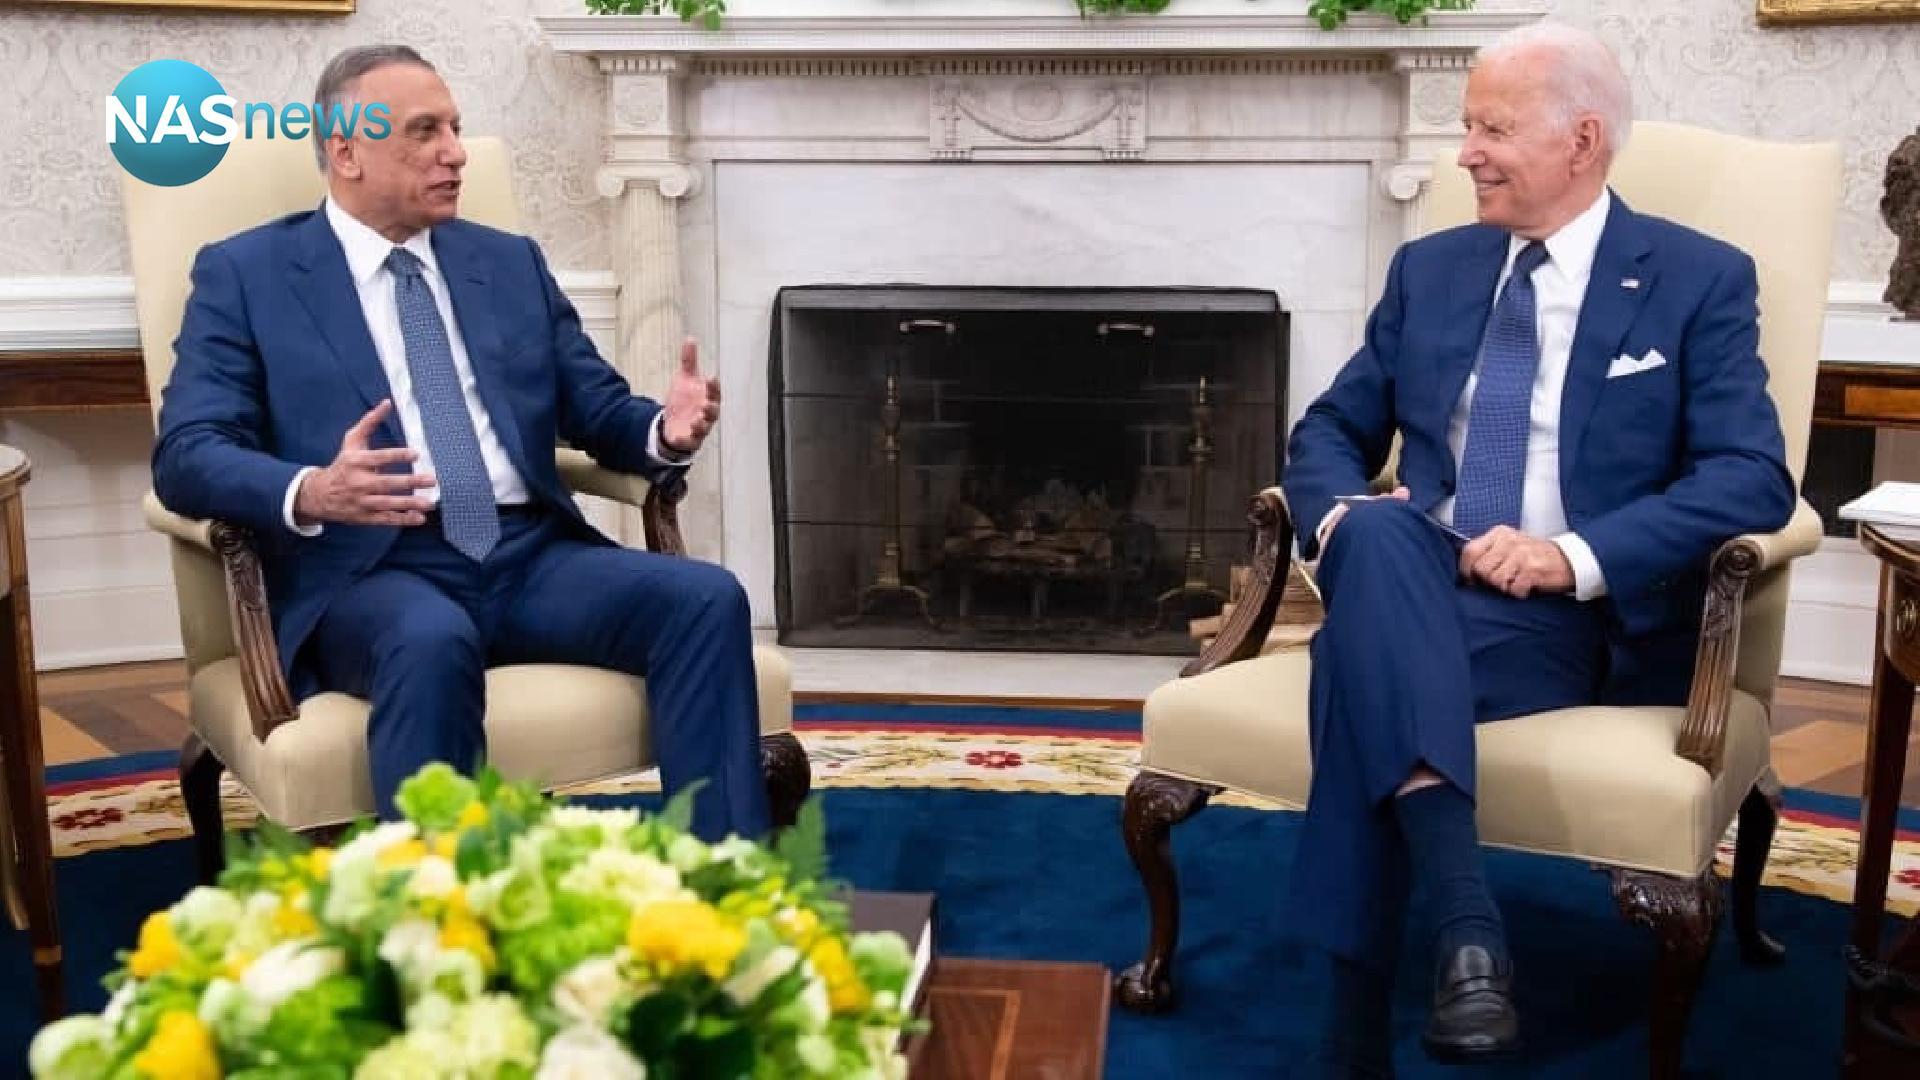 The full meeting between Joe Biden and Mustafa Al-Kazemi at the White House (video and photos)